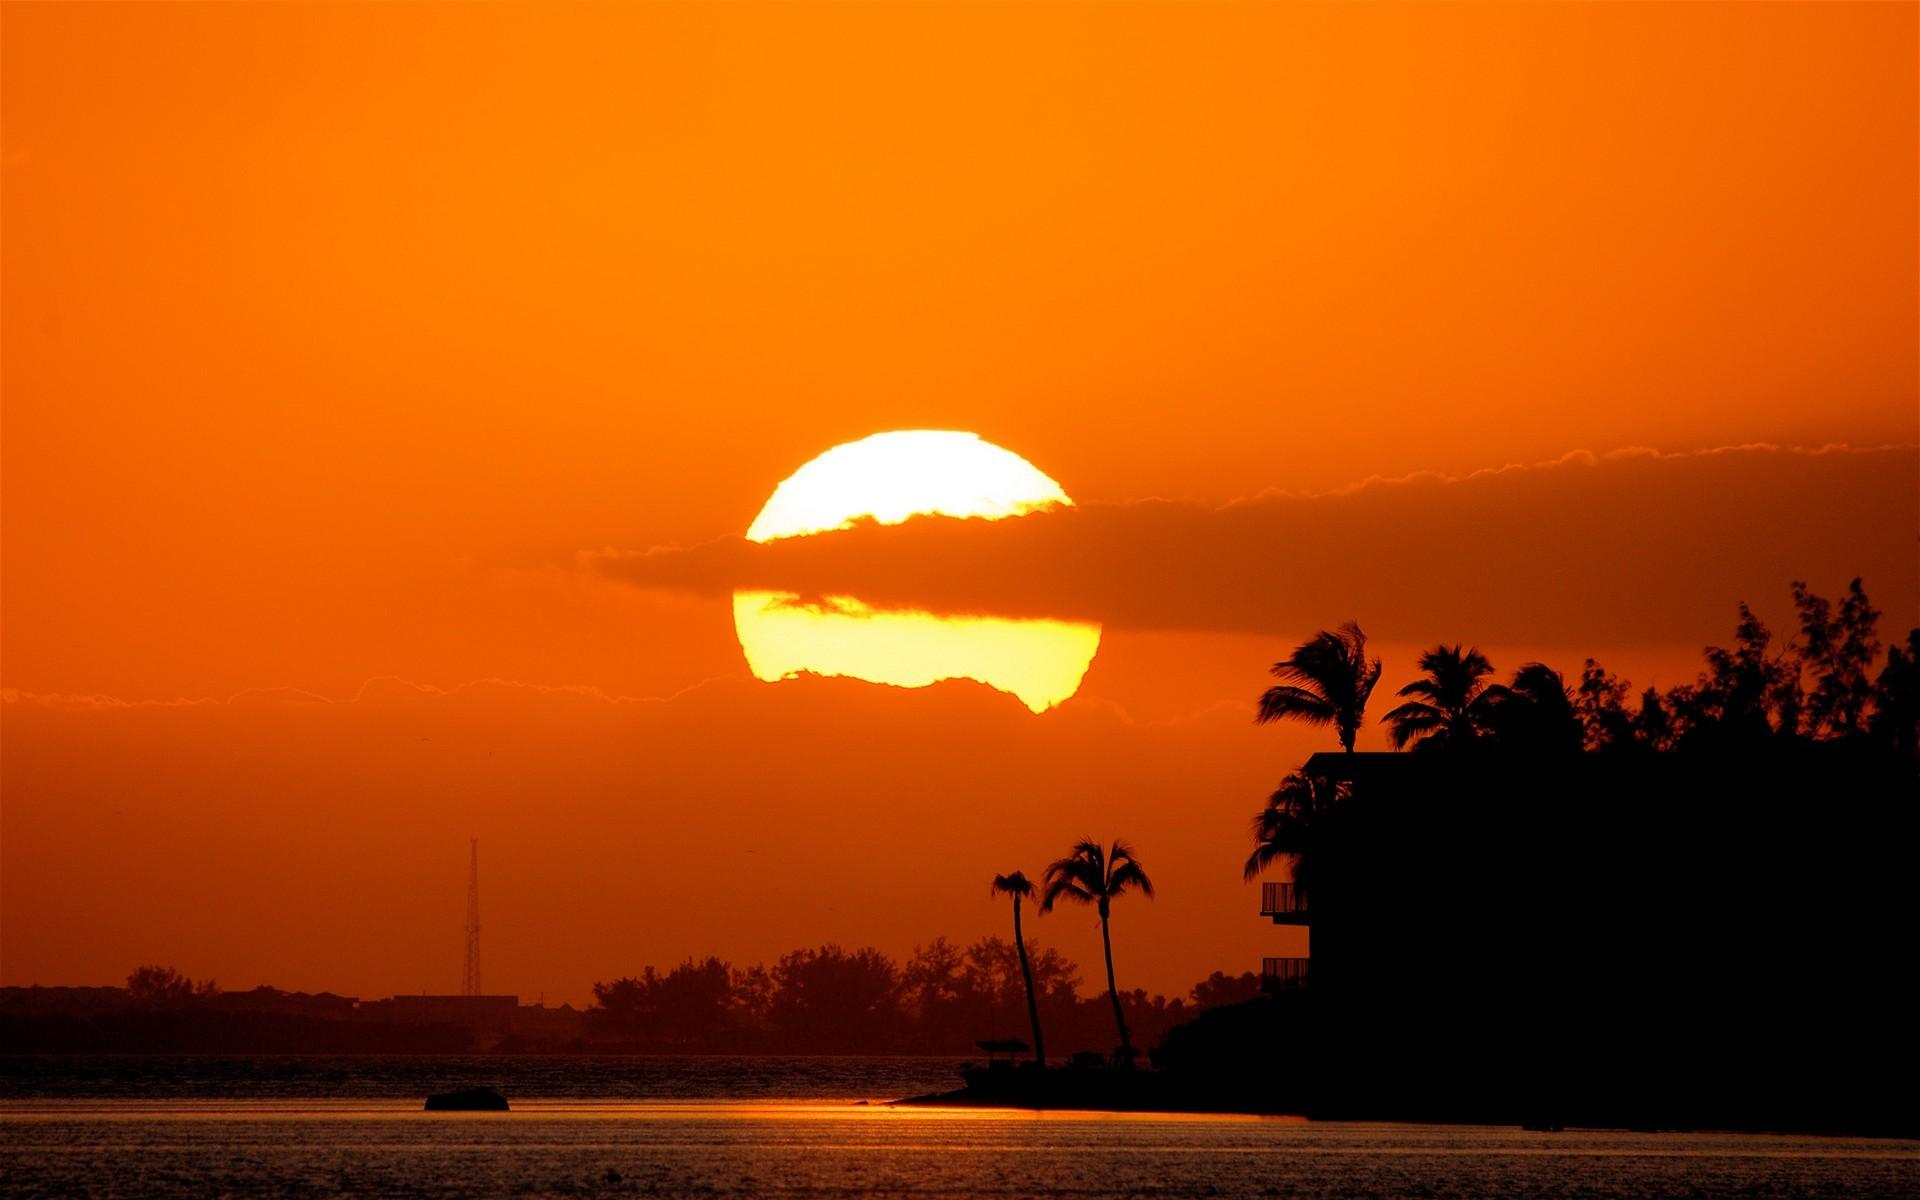 Wallpaper Bright Tropical Sunset 1920 1080 HDTV 1080p